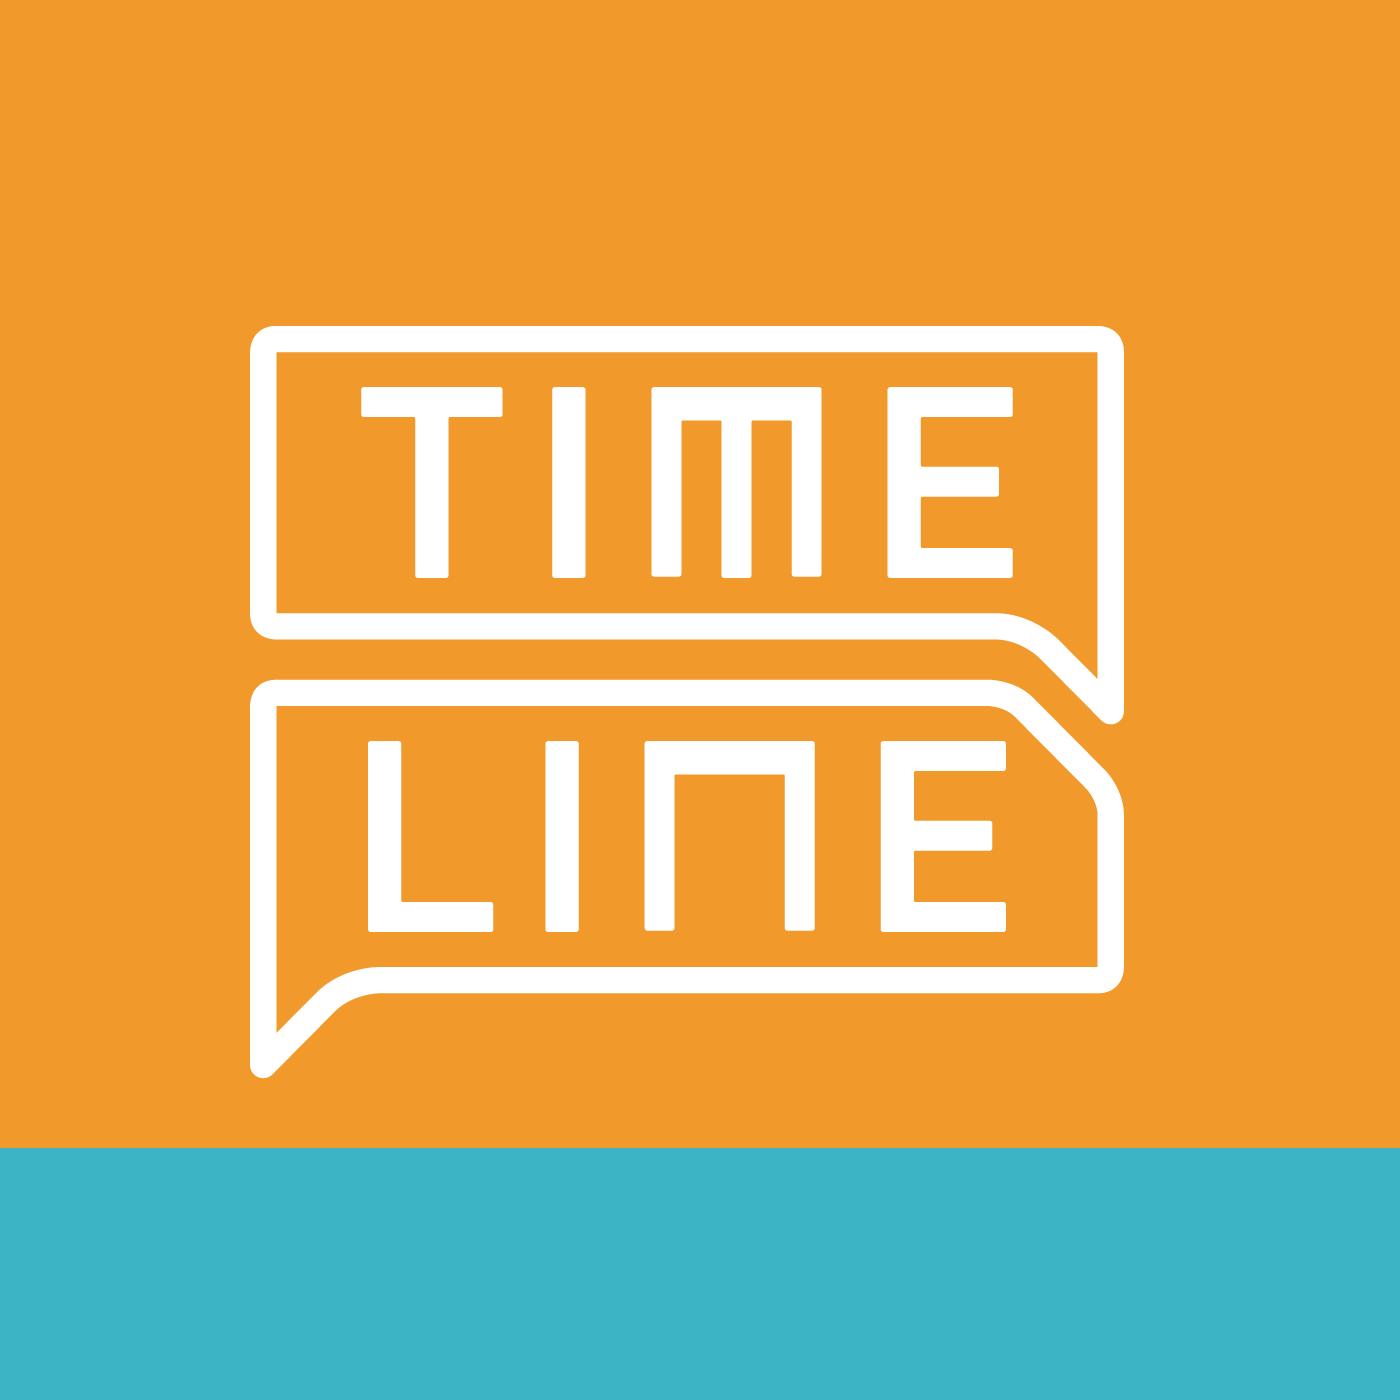 Timeline Gaúcha 21.03.2018